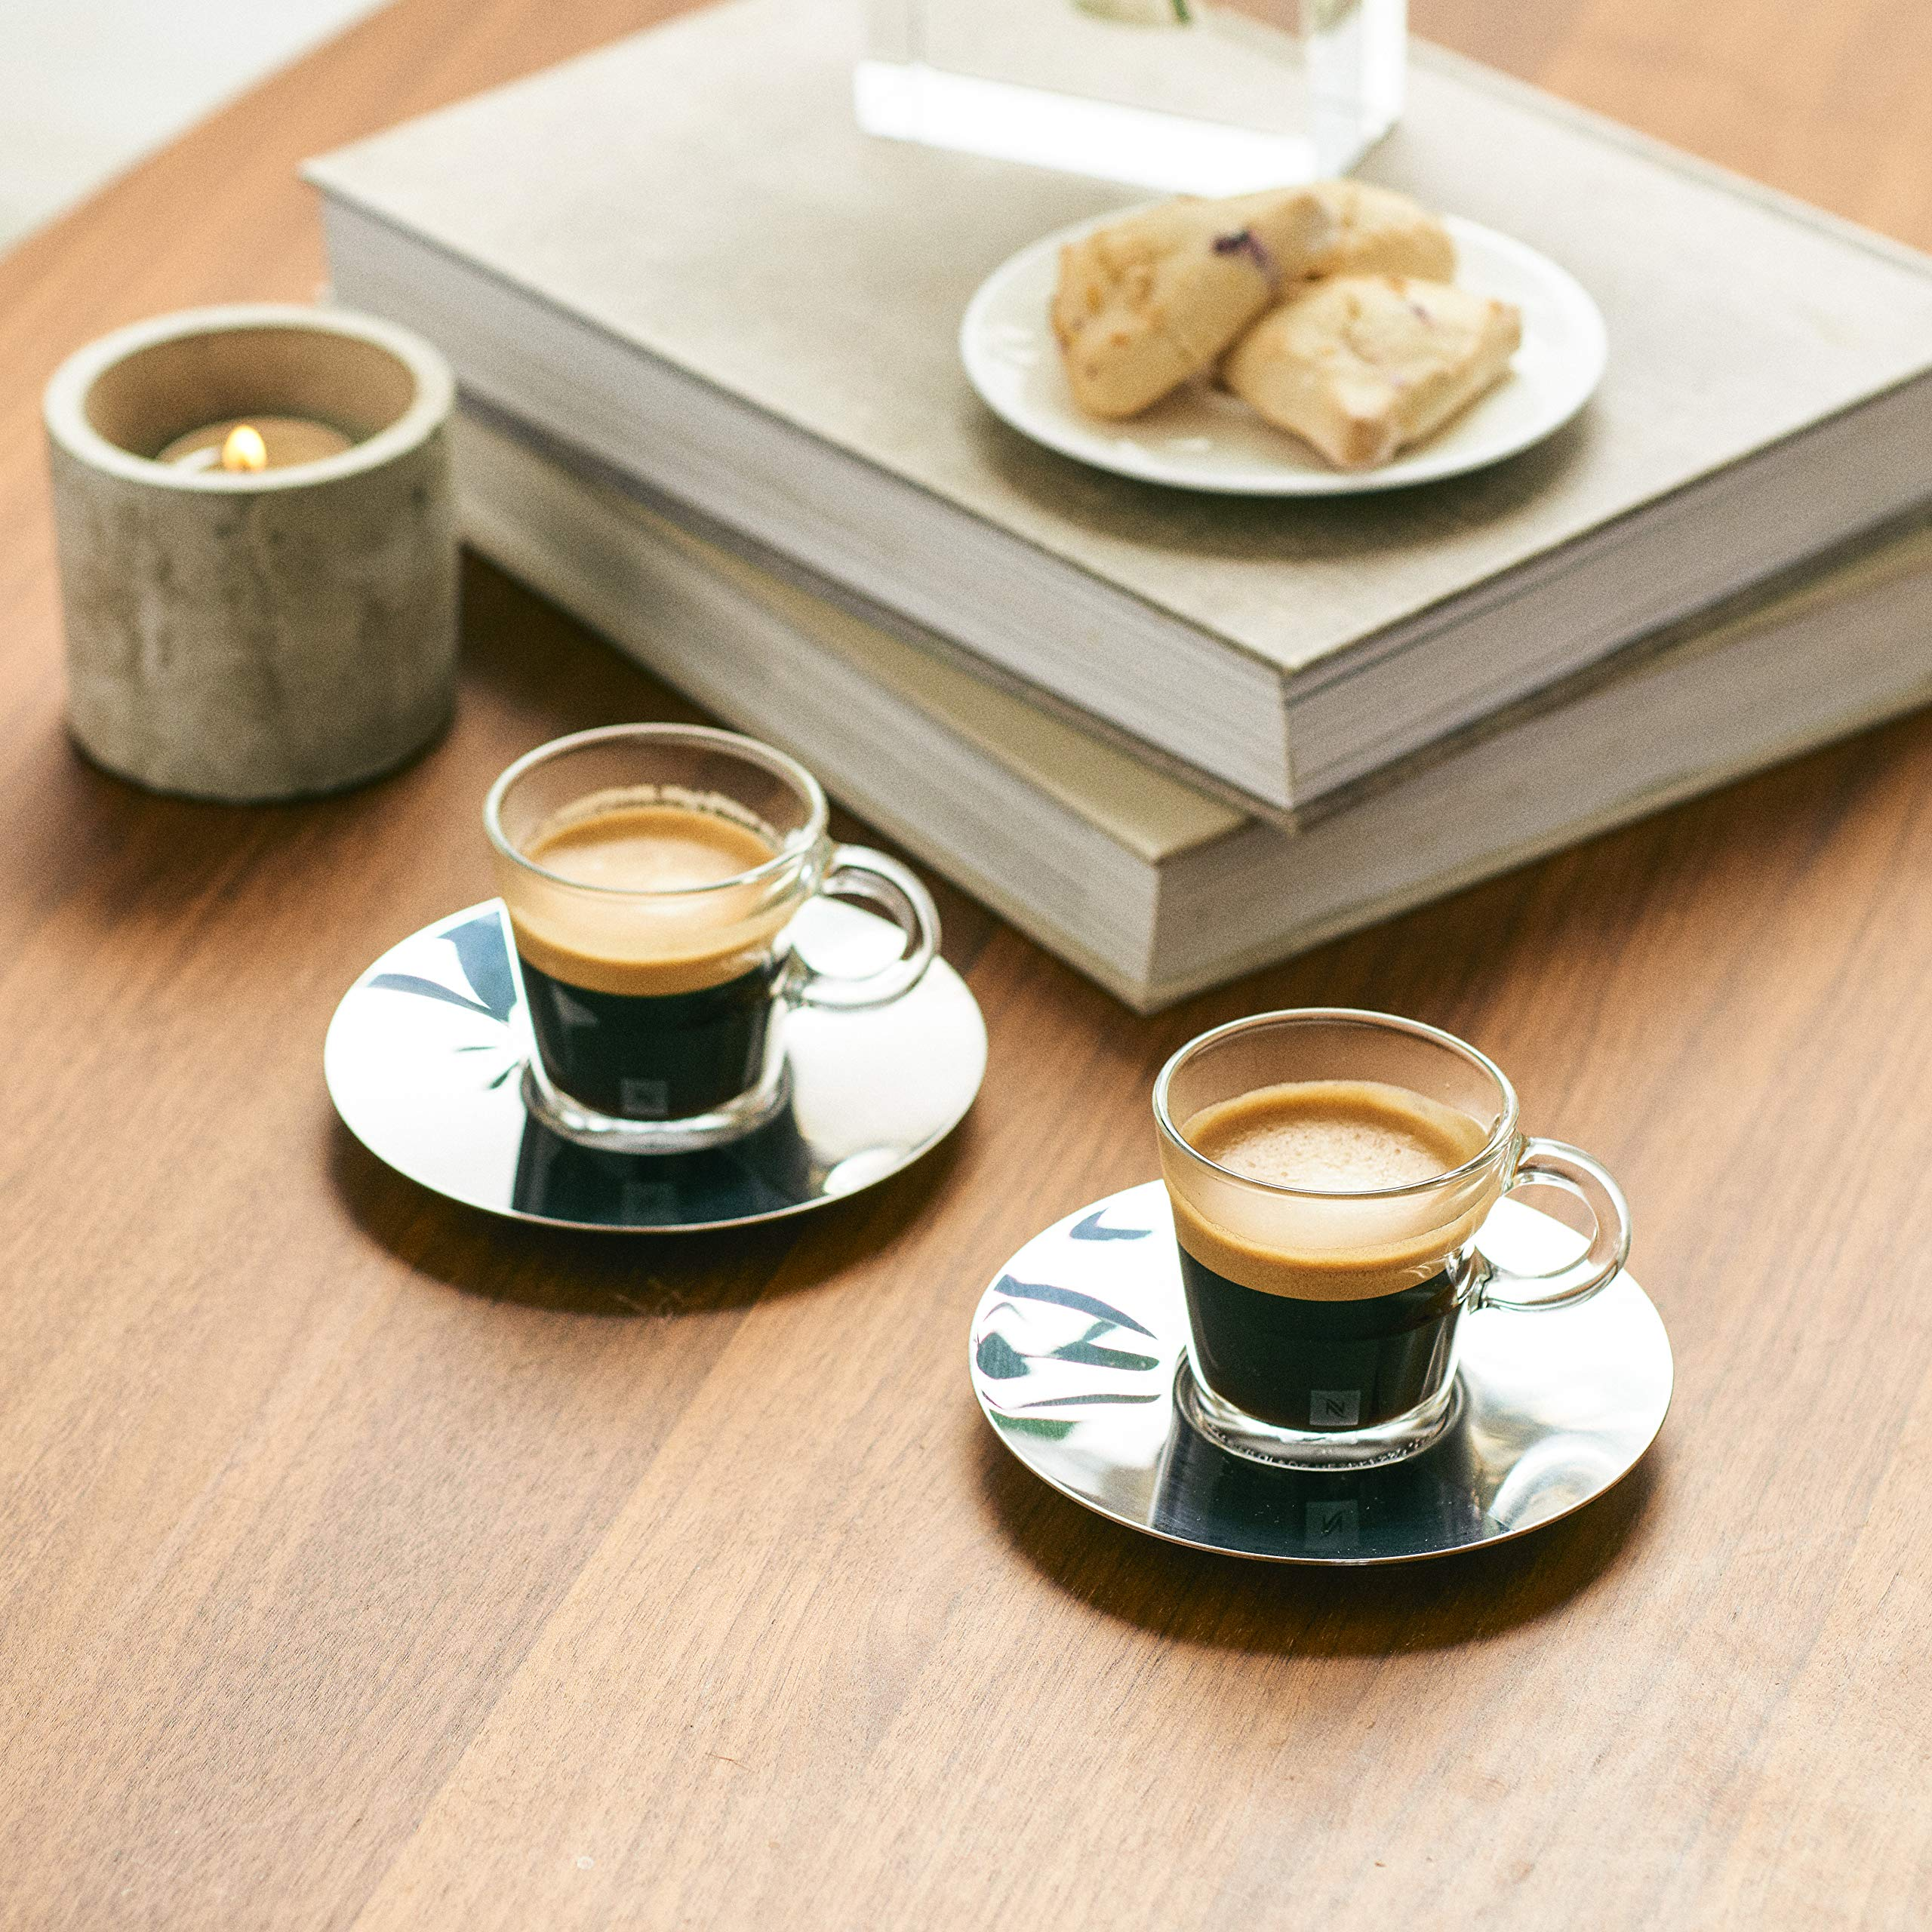 Nespresso OriginalLine Espresso Capsules Variety Pack, 100 Count by Nestle Nespresso (Image #3)